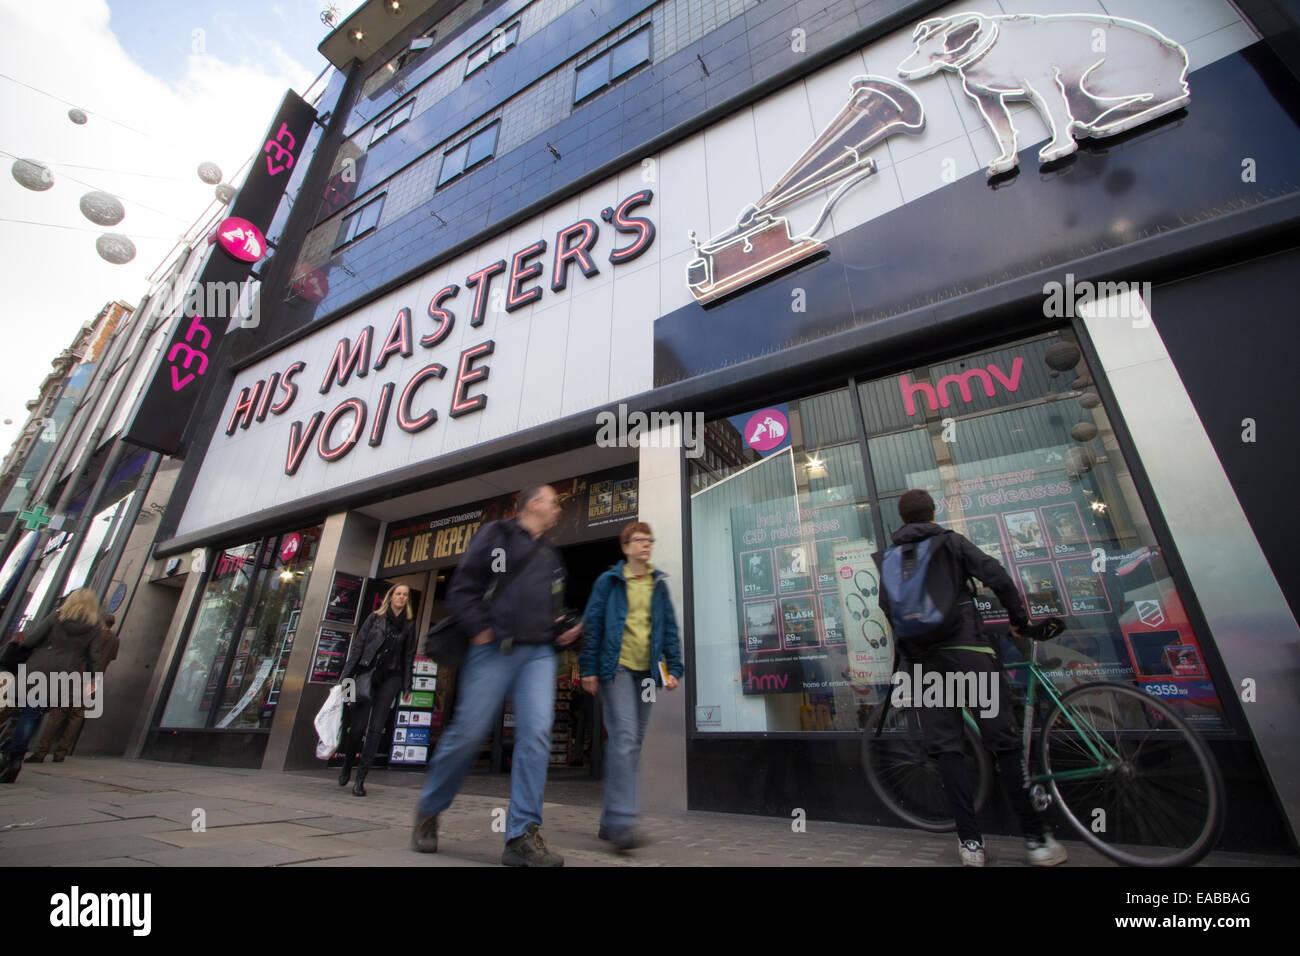 His Masters Voice HMV shop Oxford street, London - Stock Image